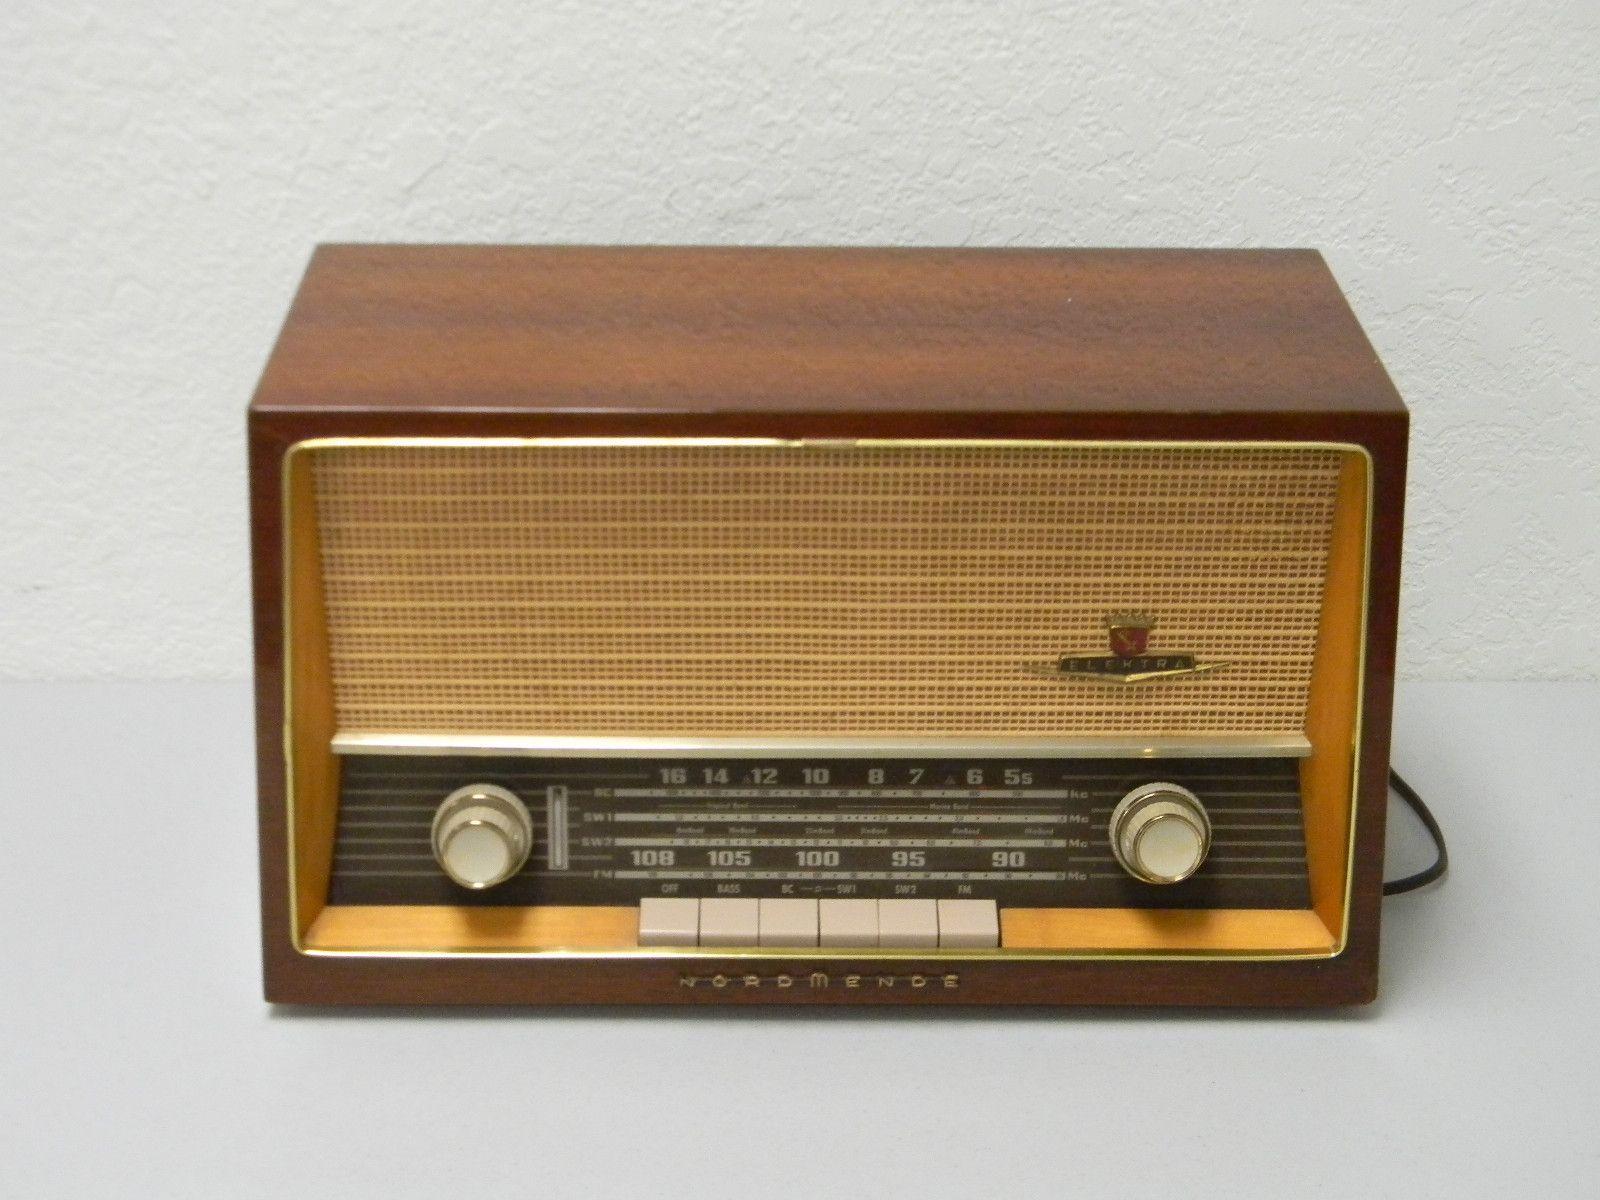 Nordmende Elektra C Shortwave Am Fm Tube Radio West Germany Antique Radio Vintage Radio Old Radios